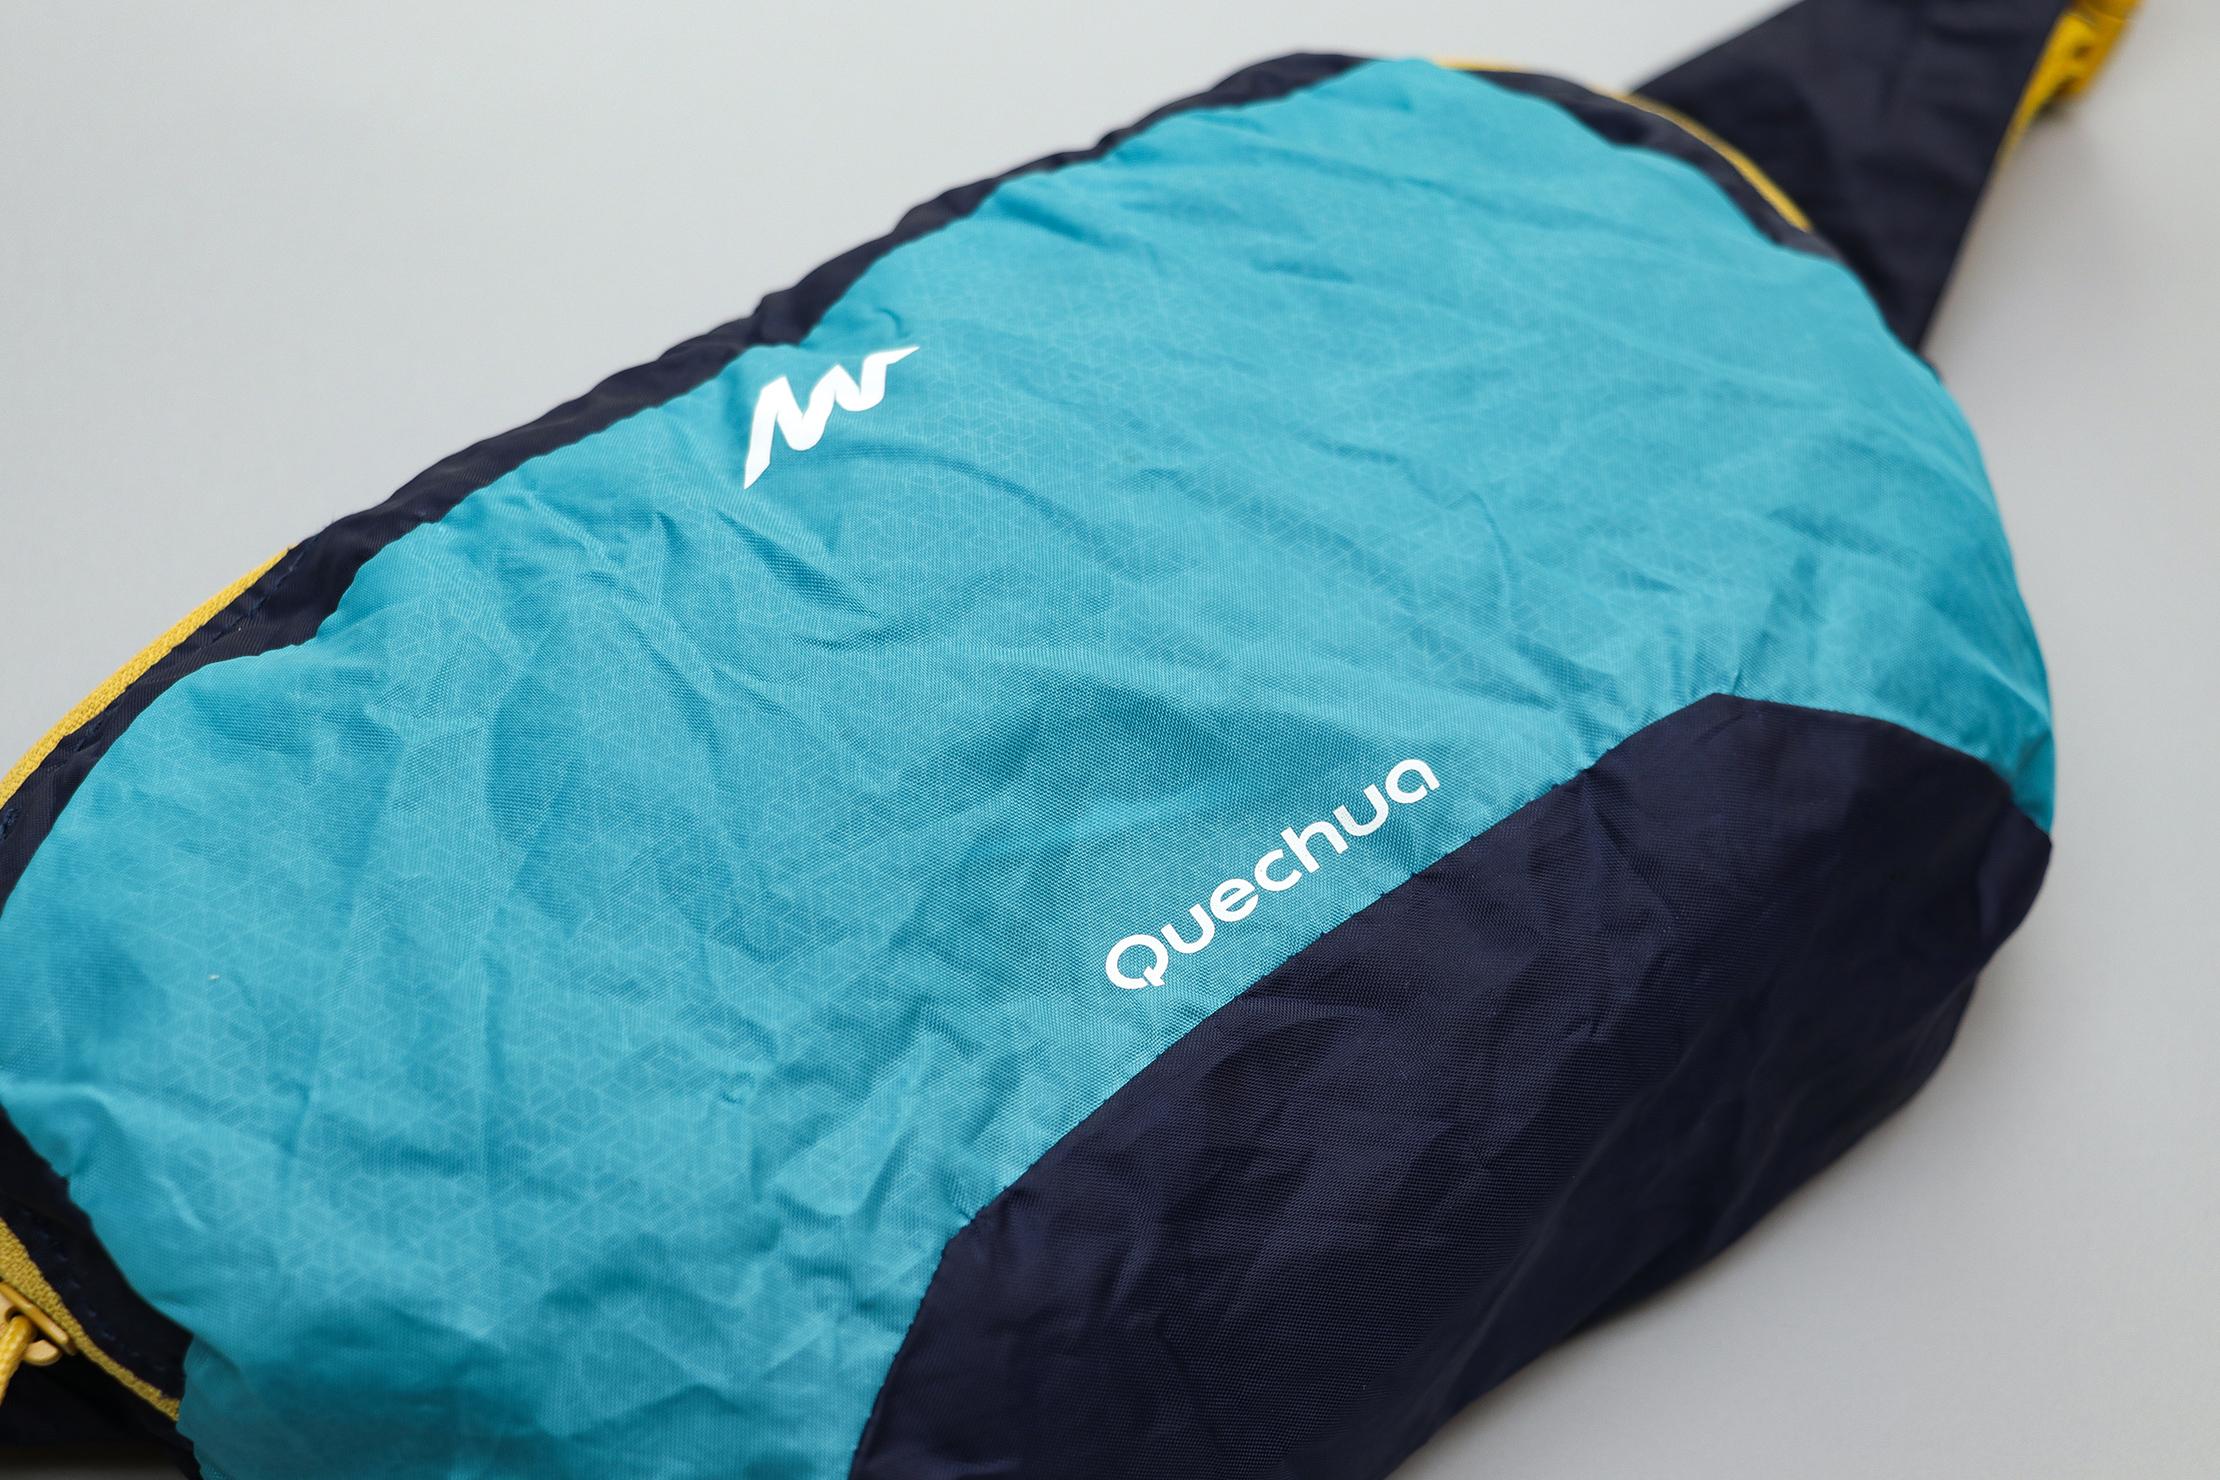 Quechua Ultra Compact Travel Waist Pack Logo And Material